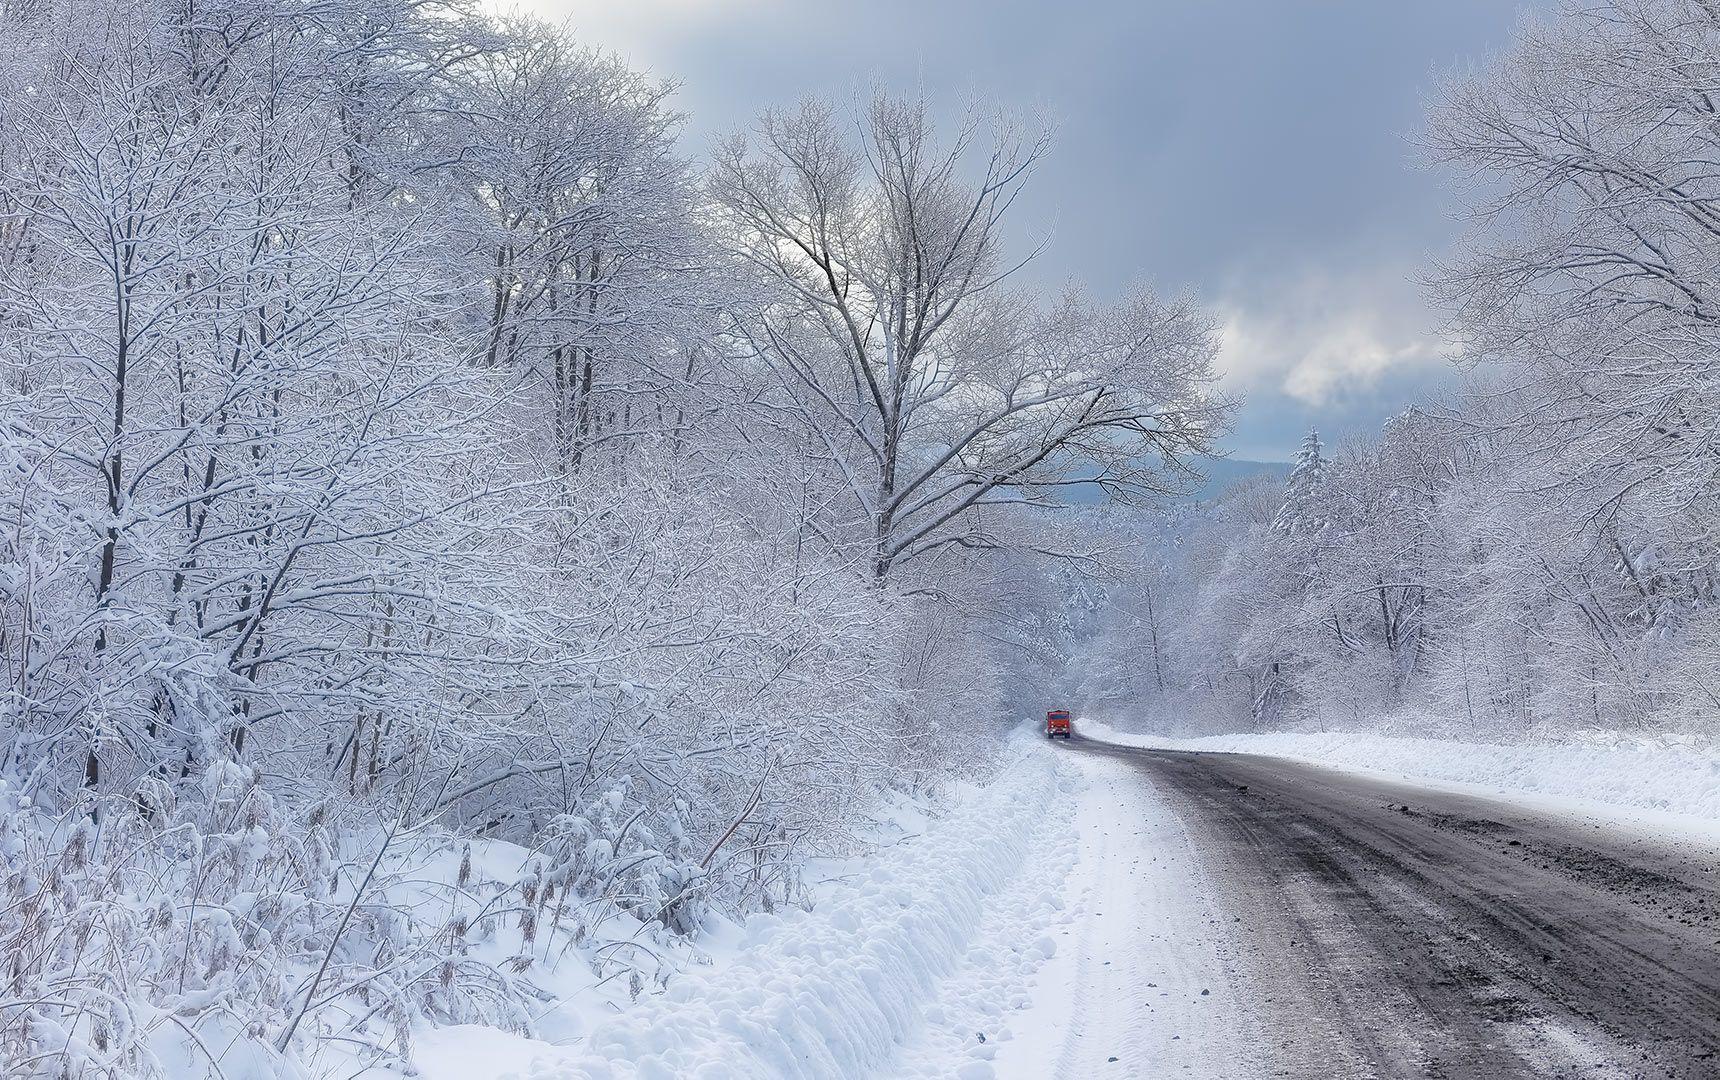 камаз зима Перевал камаз Приморская тайга